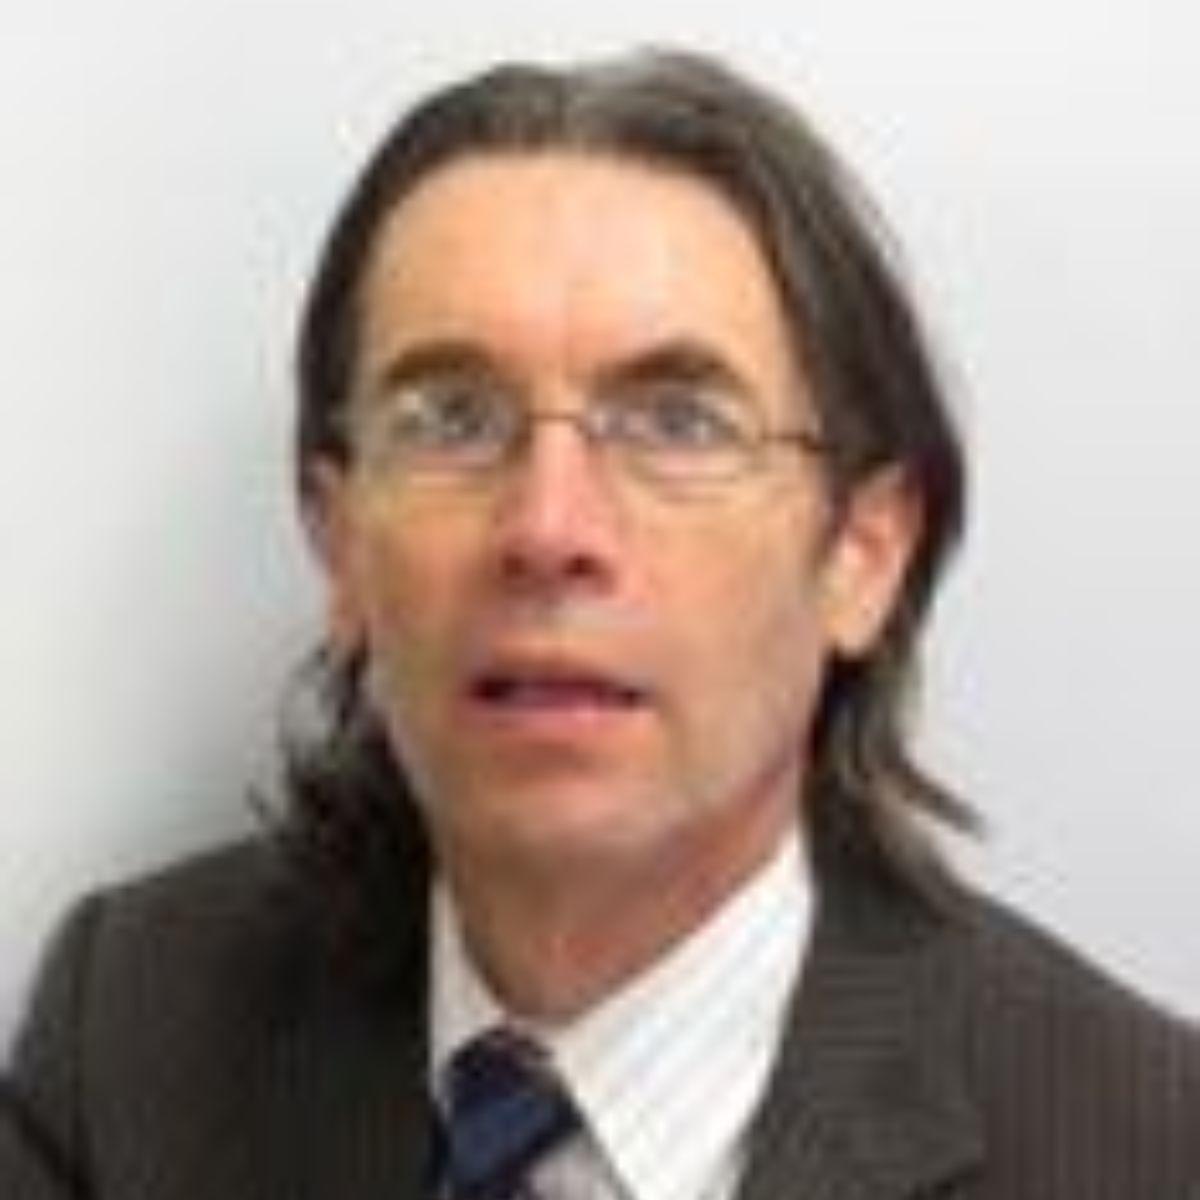 https://www.eastborderregion.com/wp-content/uploads/2021/04/Monaghan20-AidanCampbell.jpg